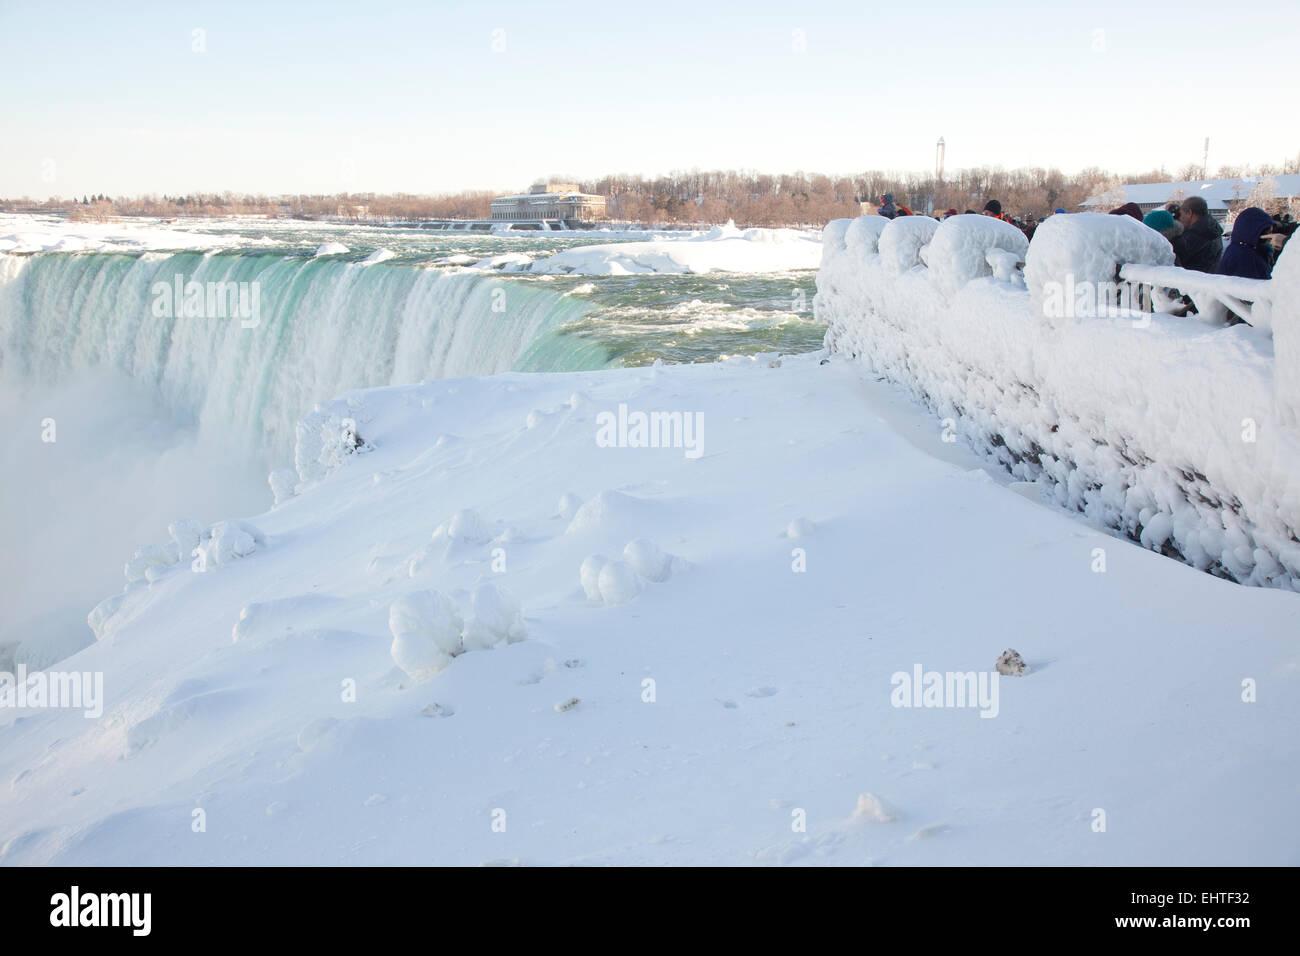 TORONTO - FEBRUARY 28,2015: Tourists flock to see Niagara Falls partially frozen on February 28, 2015. - Stock Image